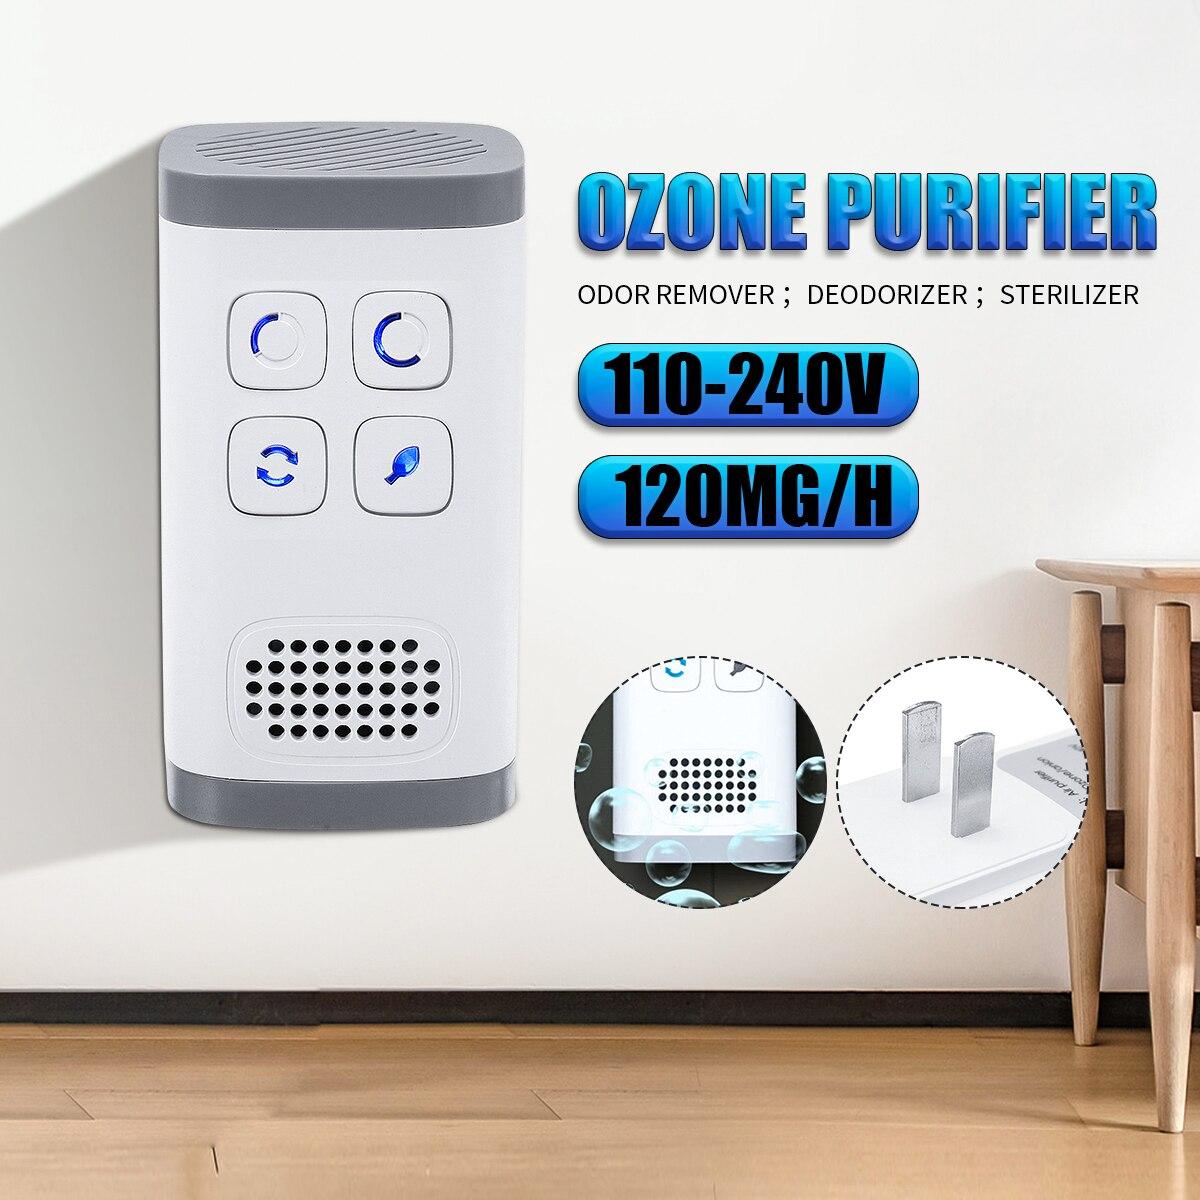 AC110-240v Air-Purifier Ozone Generator Ionizer Generator FILTER Purification Home Toilet Deodorizer Pet Deodorizer air ionizer